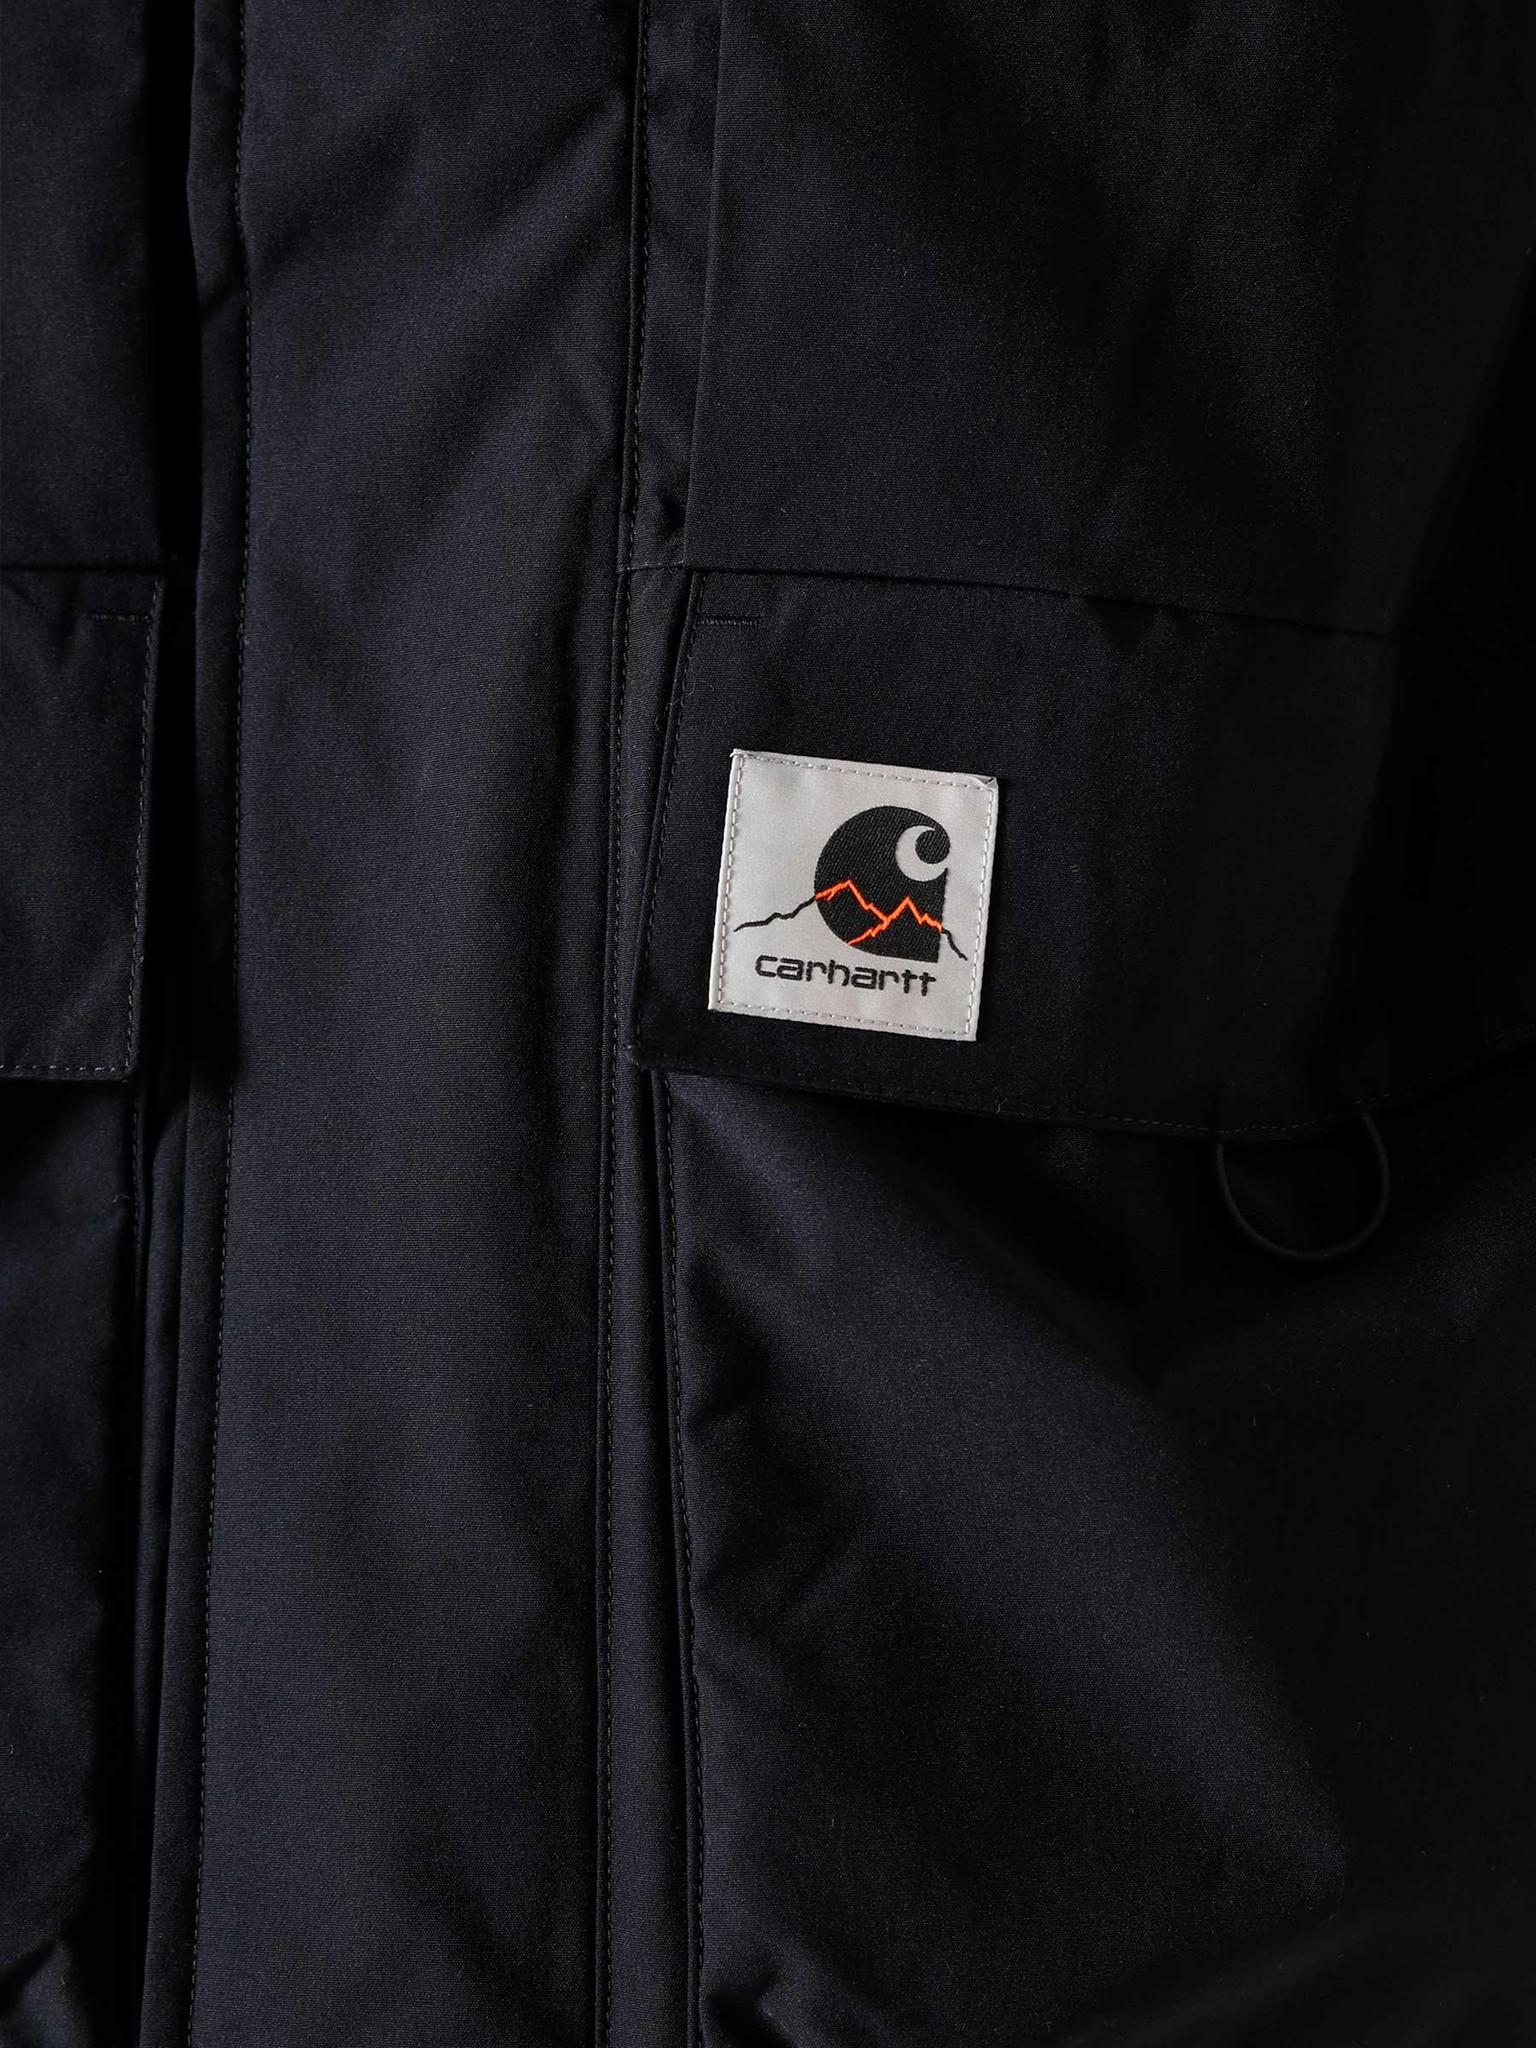 Carhartt WIP Carhartt WIP Bode Parka Dark Navy I028168-1C00